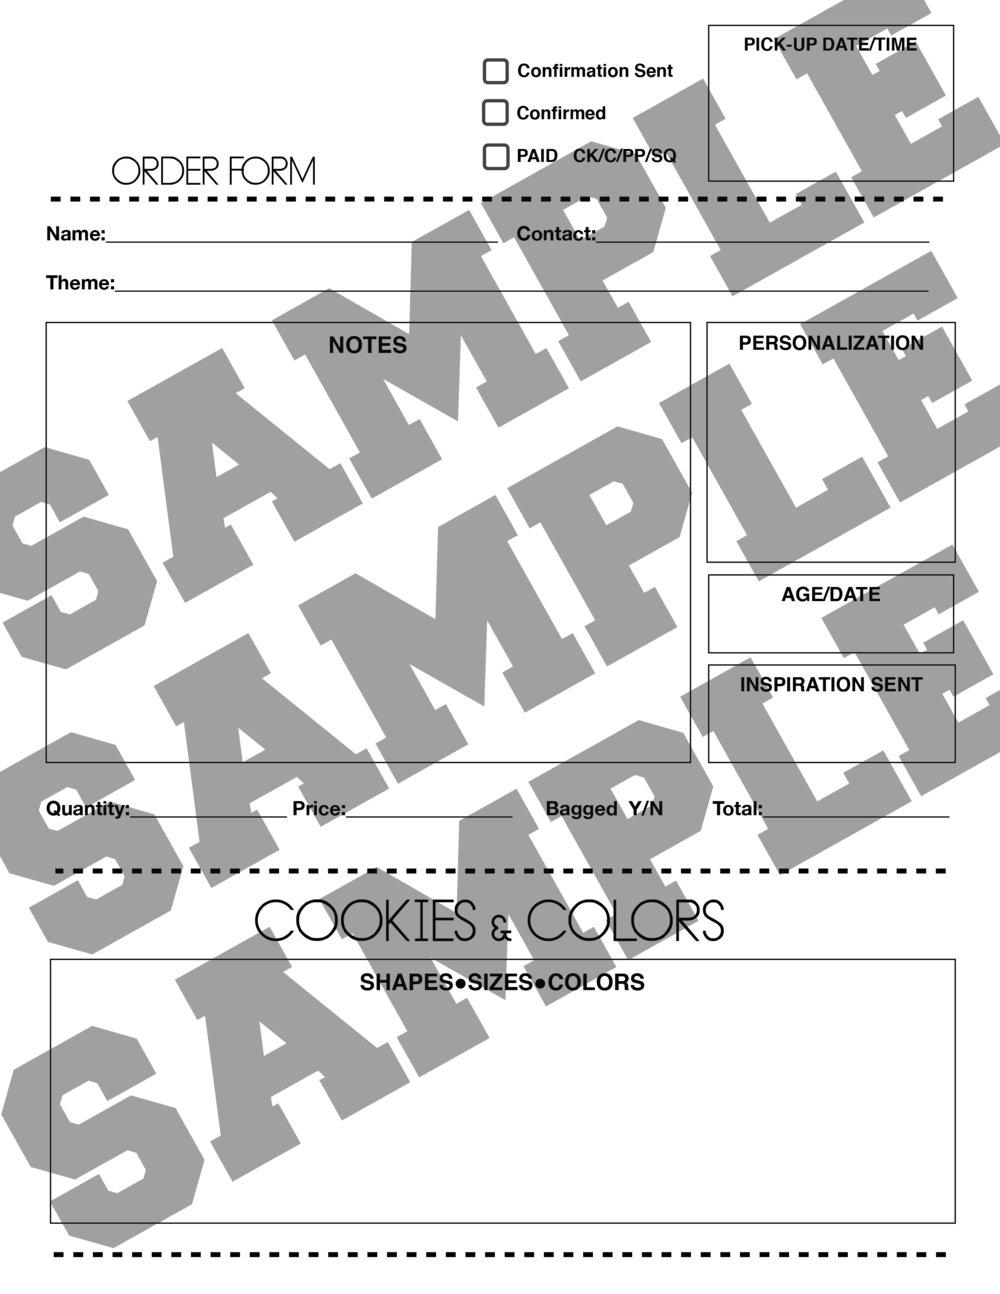 CookiesInColorOrderFormNOLOGOSAMPLE.jpg